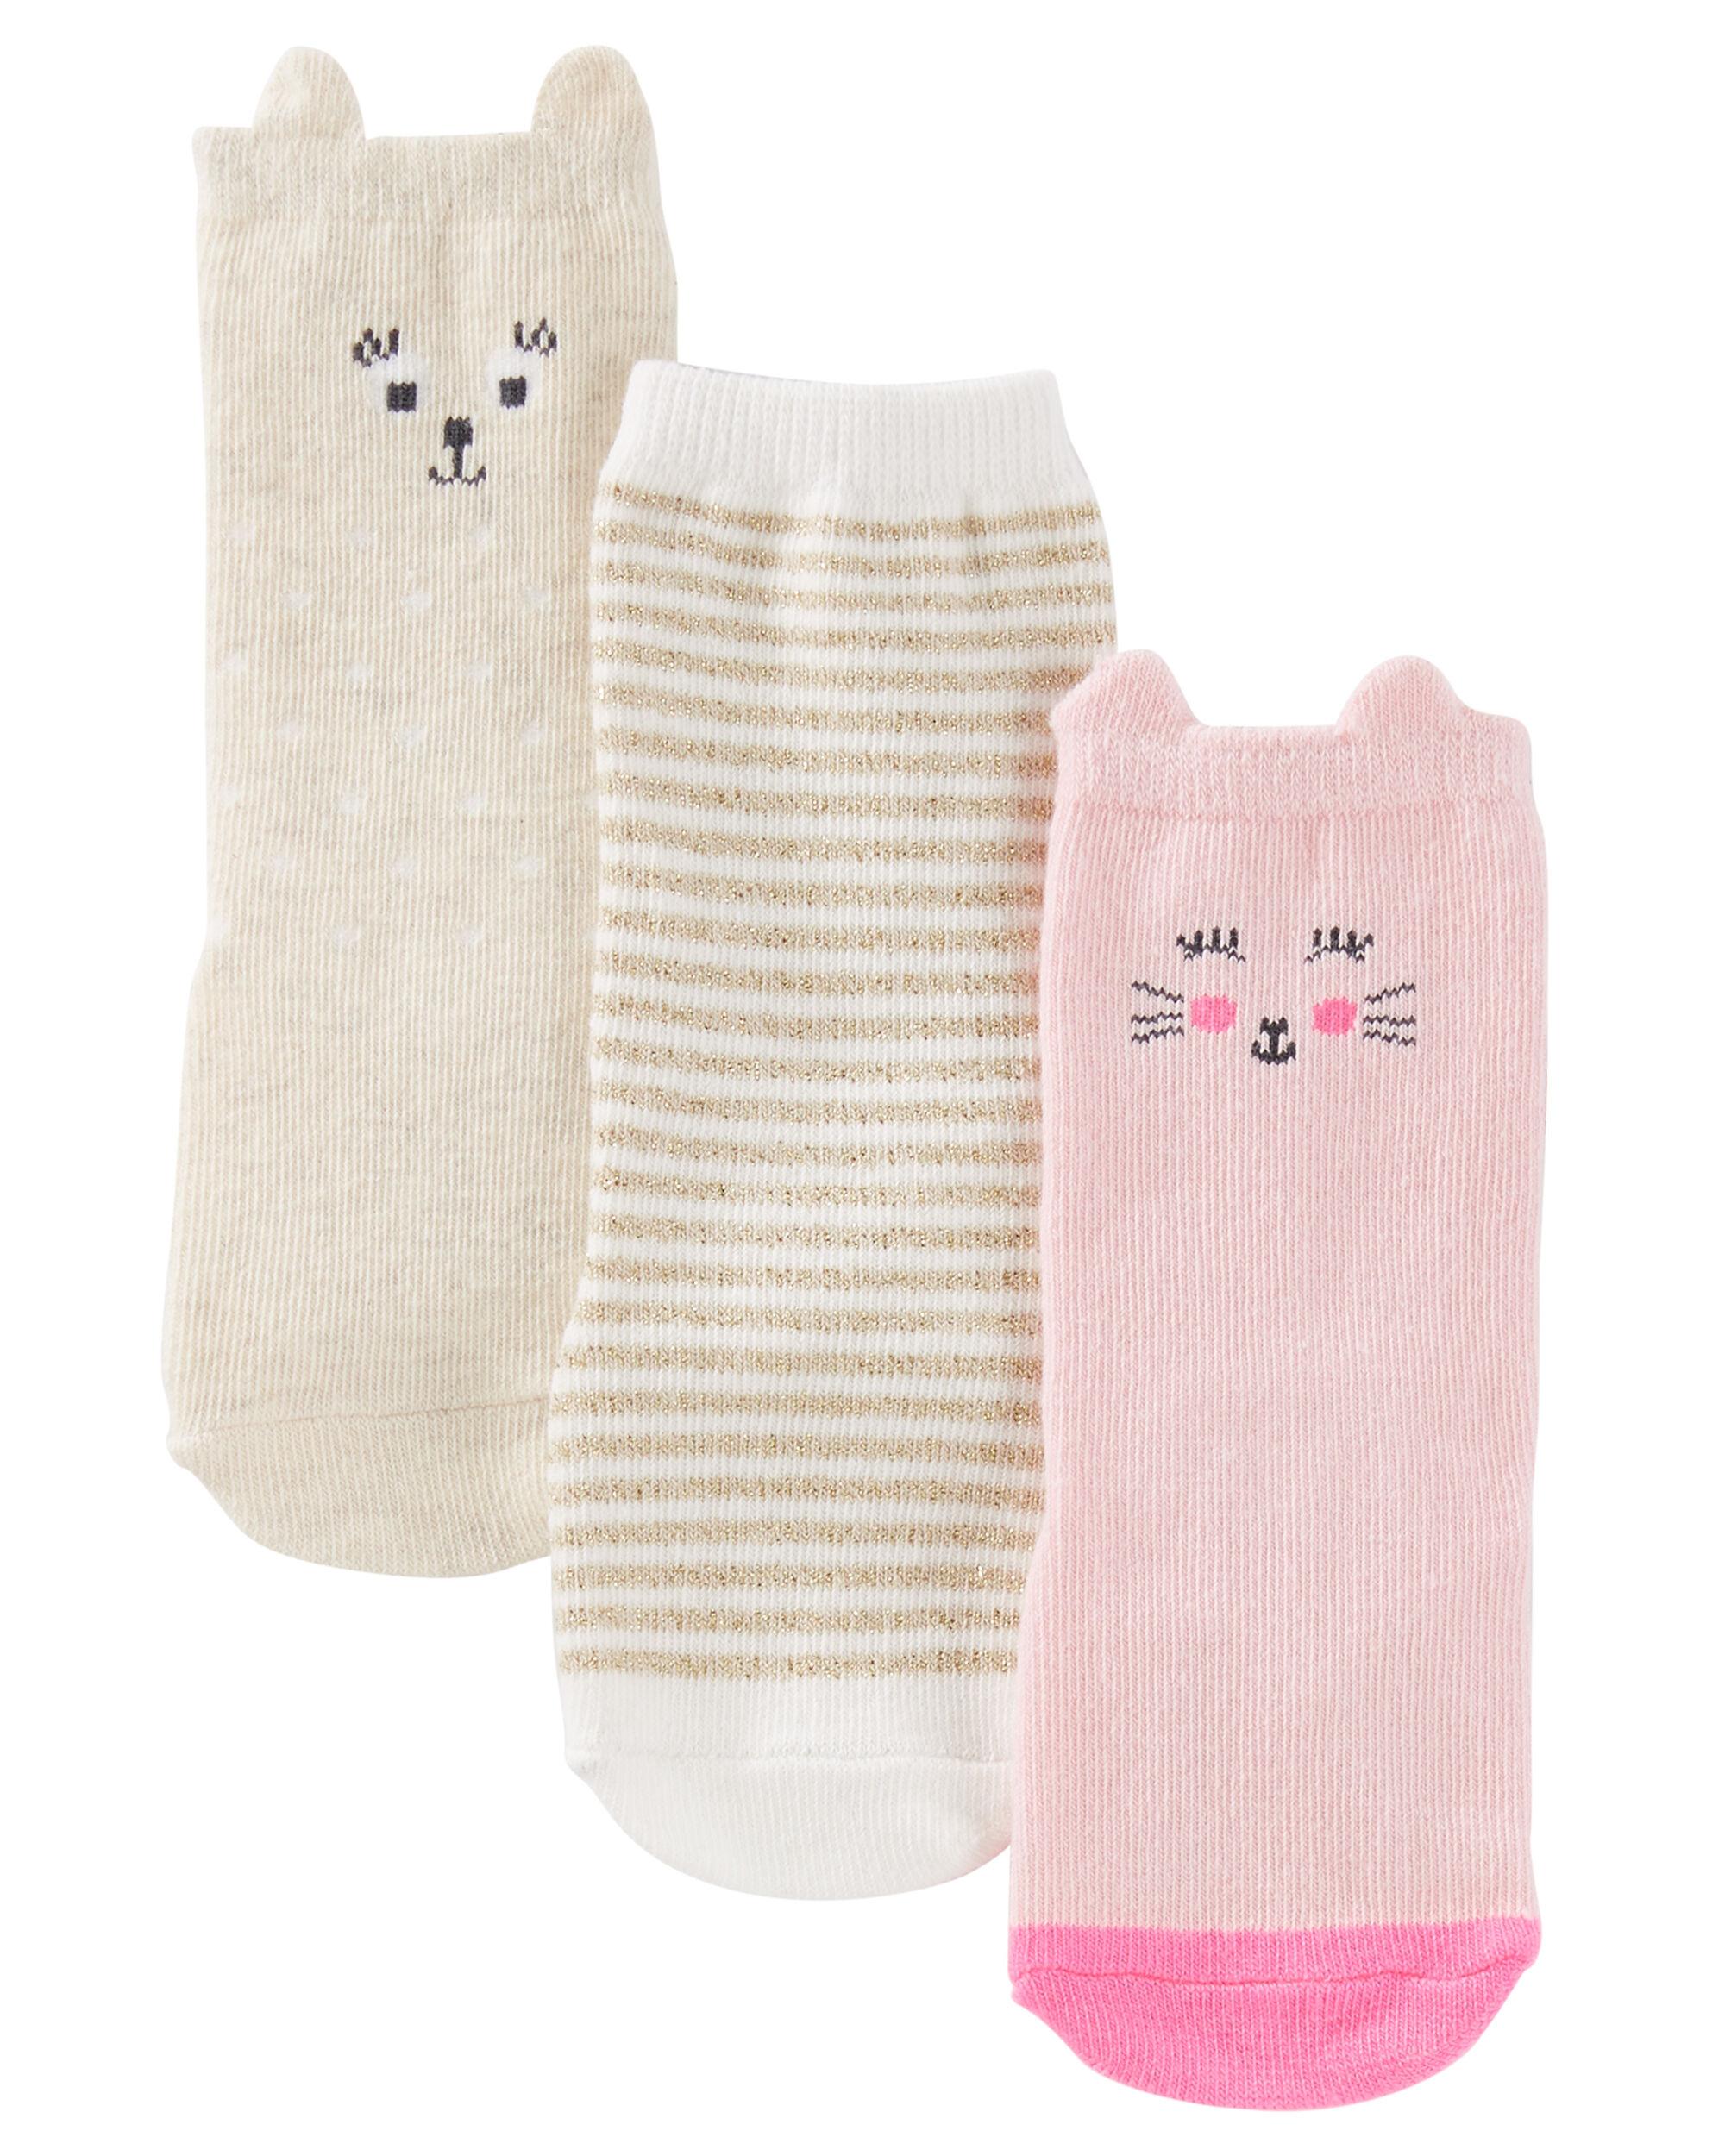 3 Pack Knee High Animal Socks